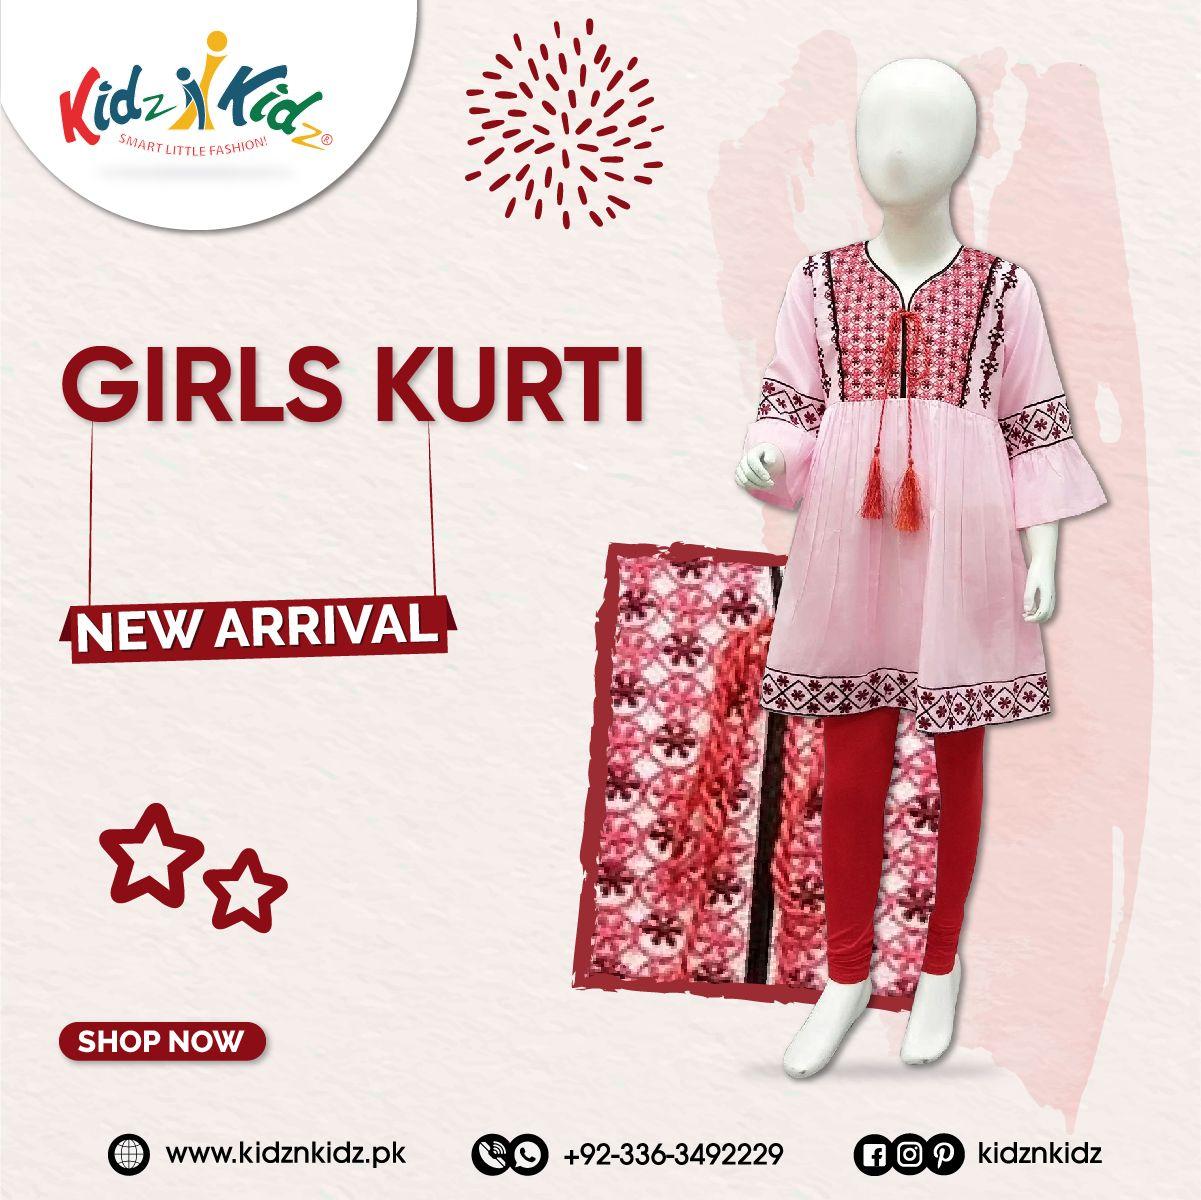 Girls Kurti, New Arrival, Shop Now #girlskurti #girls #kurti #trousers #clothingbrand #kids #baby #kidsfahions #onlineshop #shopping #onlinestore #shoppingonline #onlineshopping